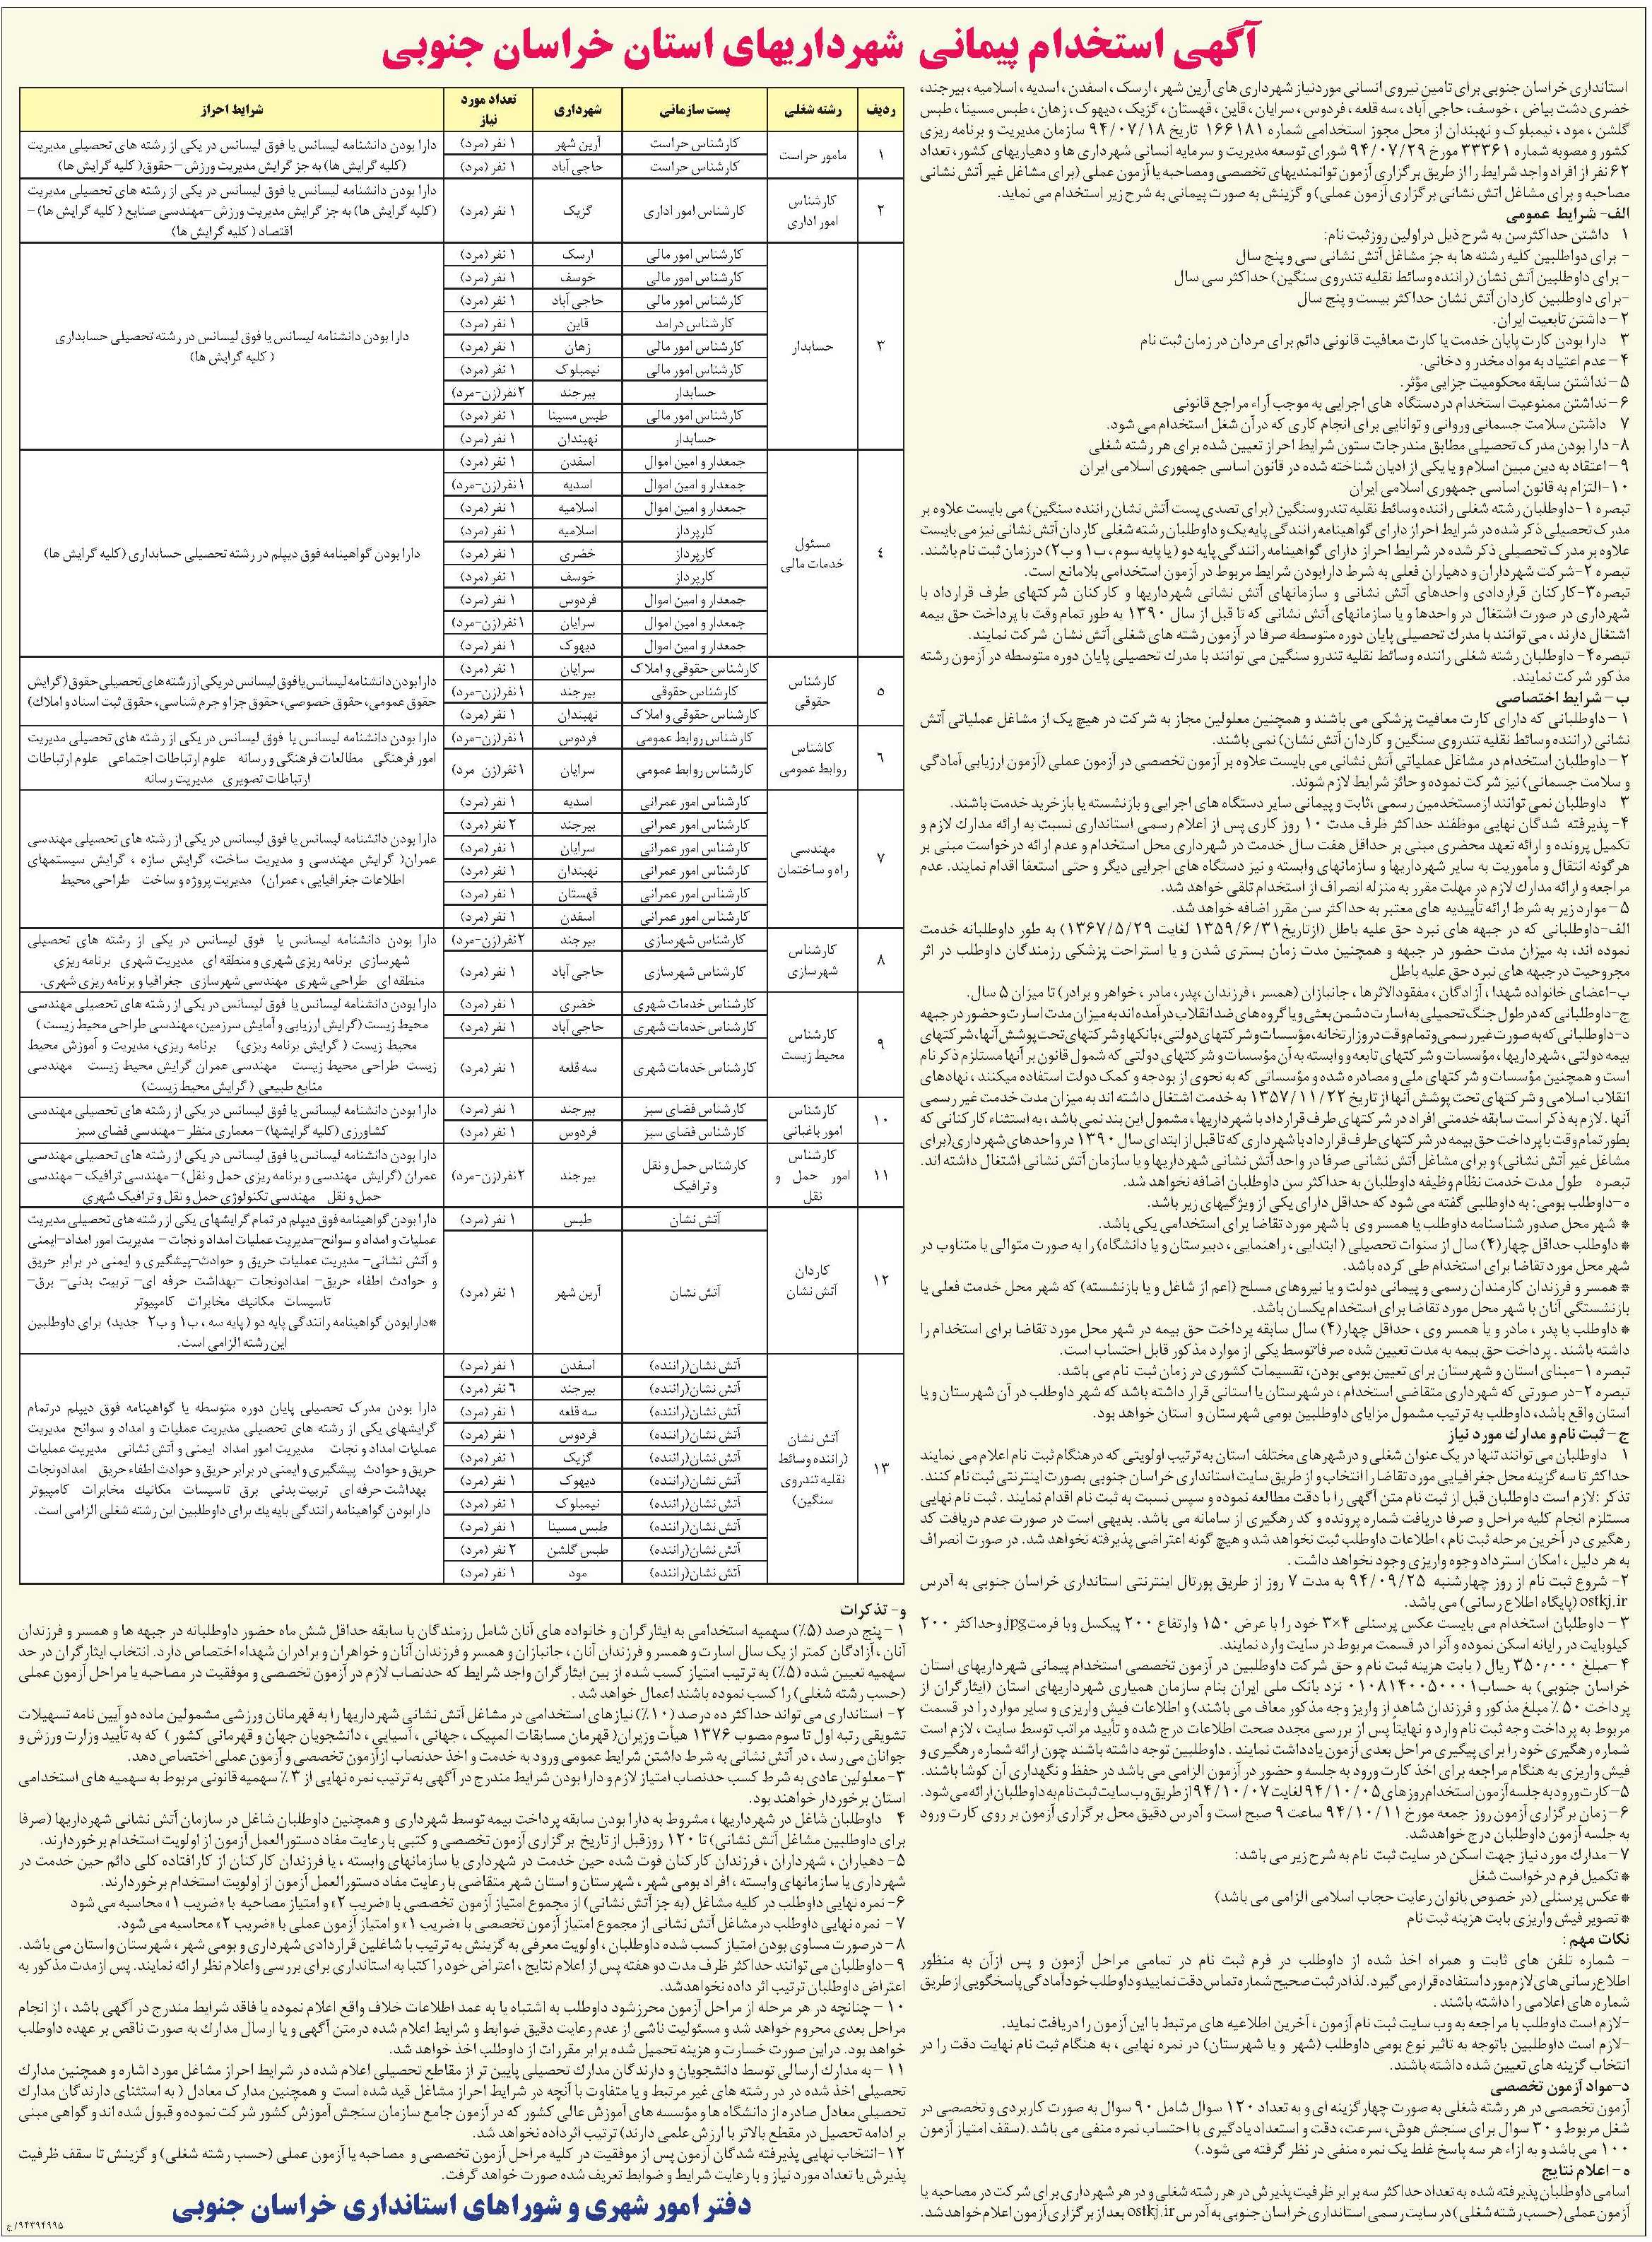 http://khorasanjonobi.khorasannews.com/content/newspaper/Version19141/0/Page8/Block4058/newspaperb_4058.jpg